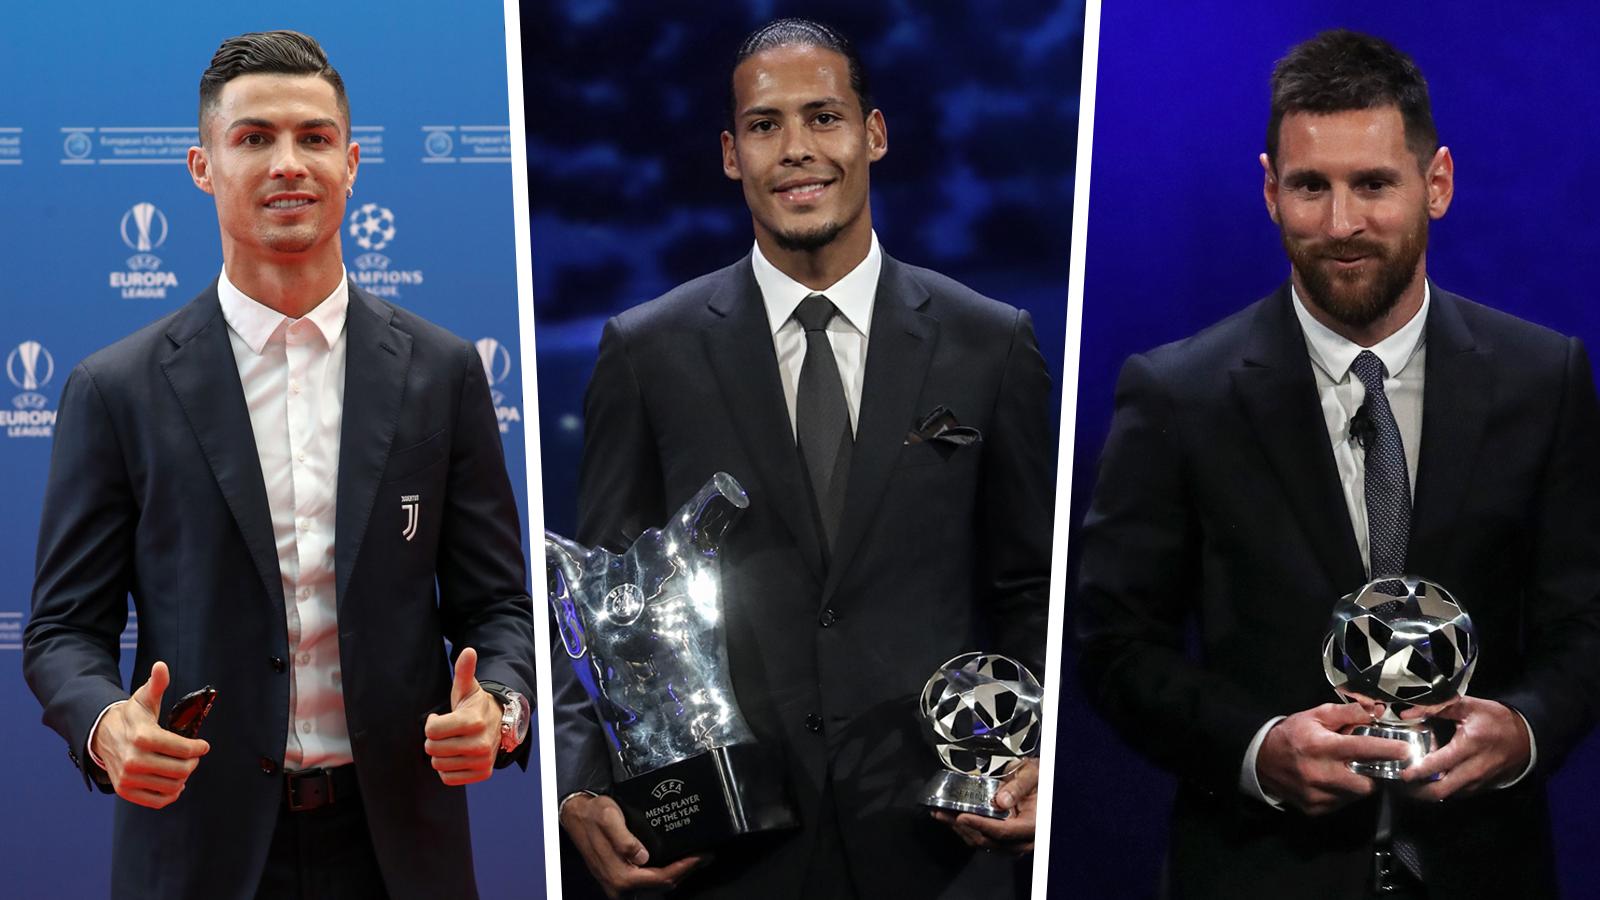 Ballon d'Or 2019 winner live blog: Van Dijk, Messi & Ronaldo vie for best player of the year award